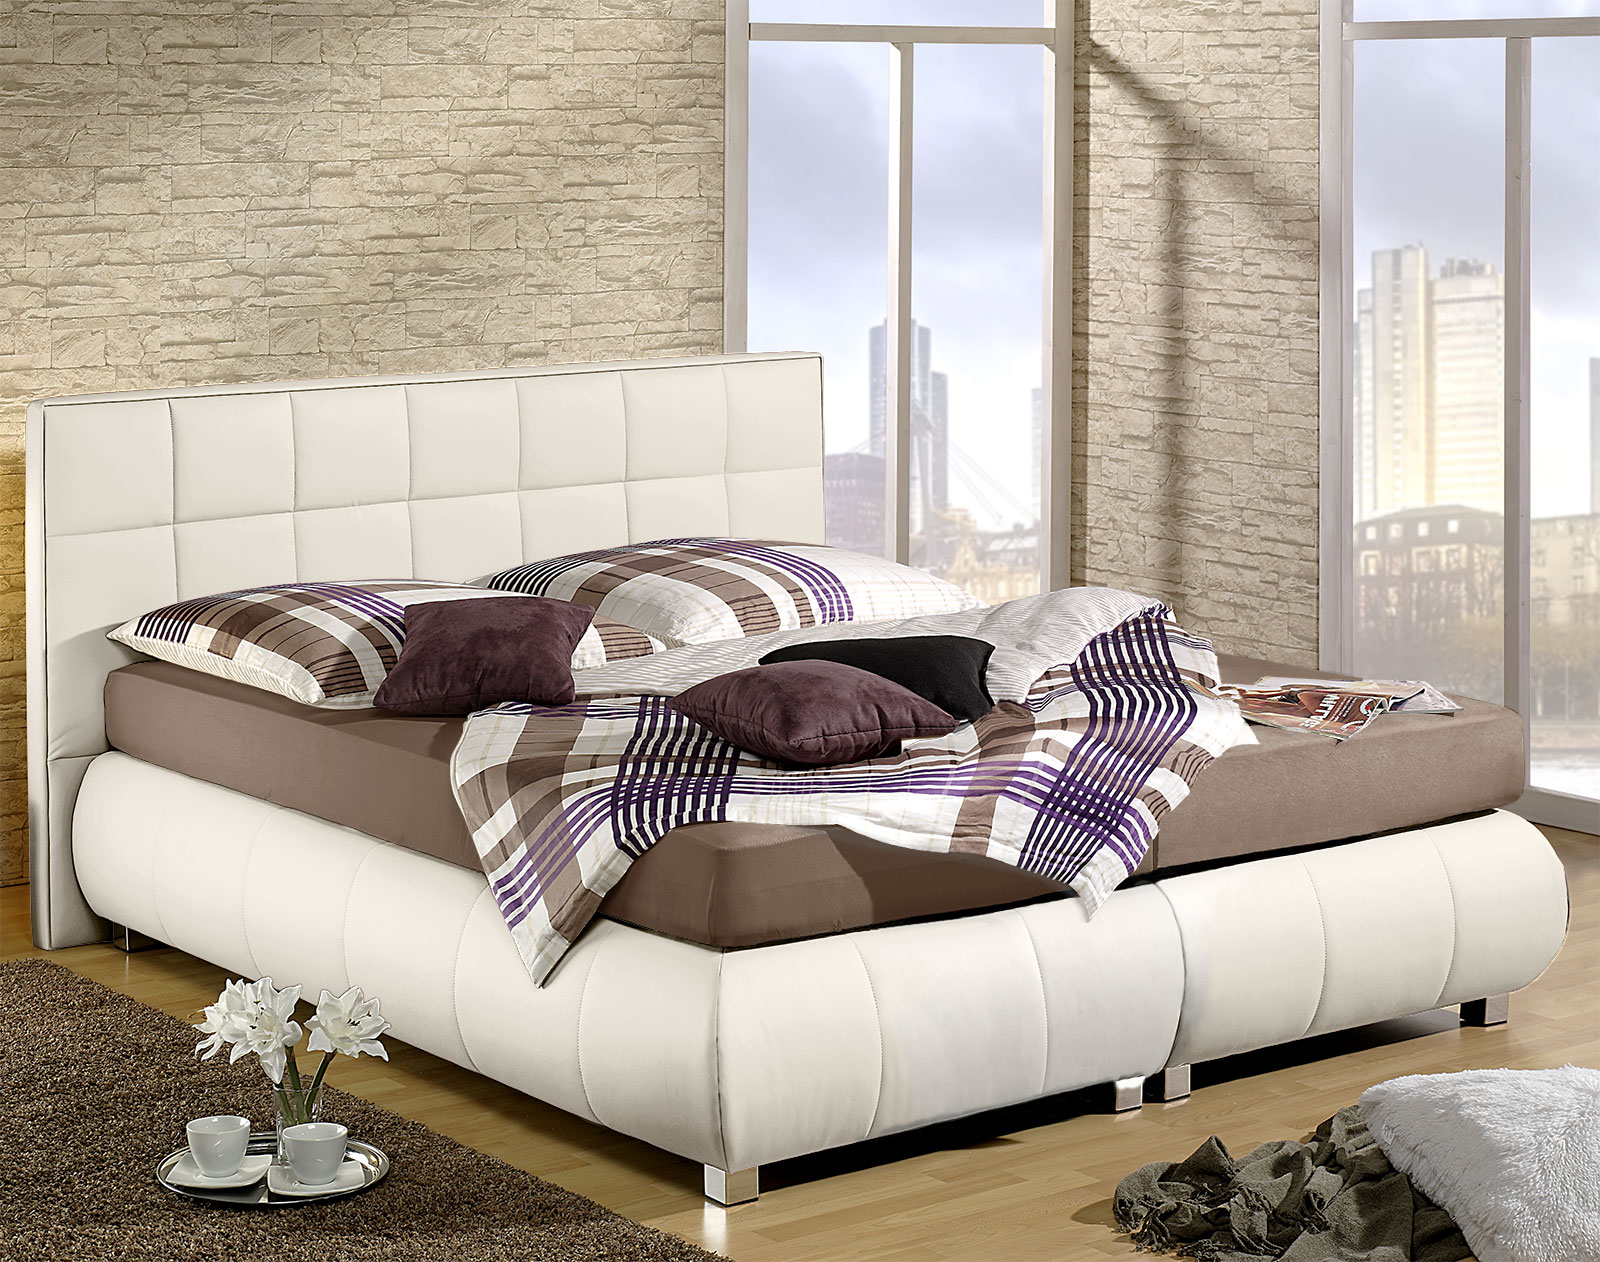 boxspringbett mit kunstleder bezug seattle. Black Bedroom Furniture Sets. Home Design Ideas